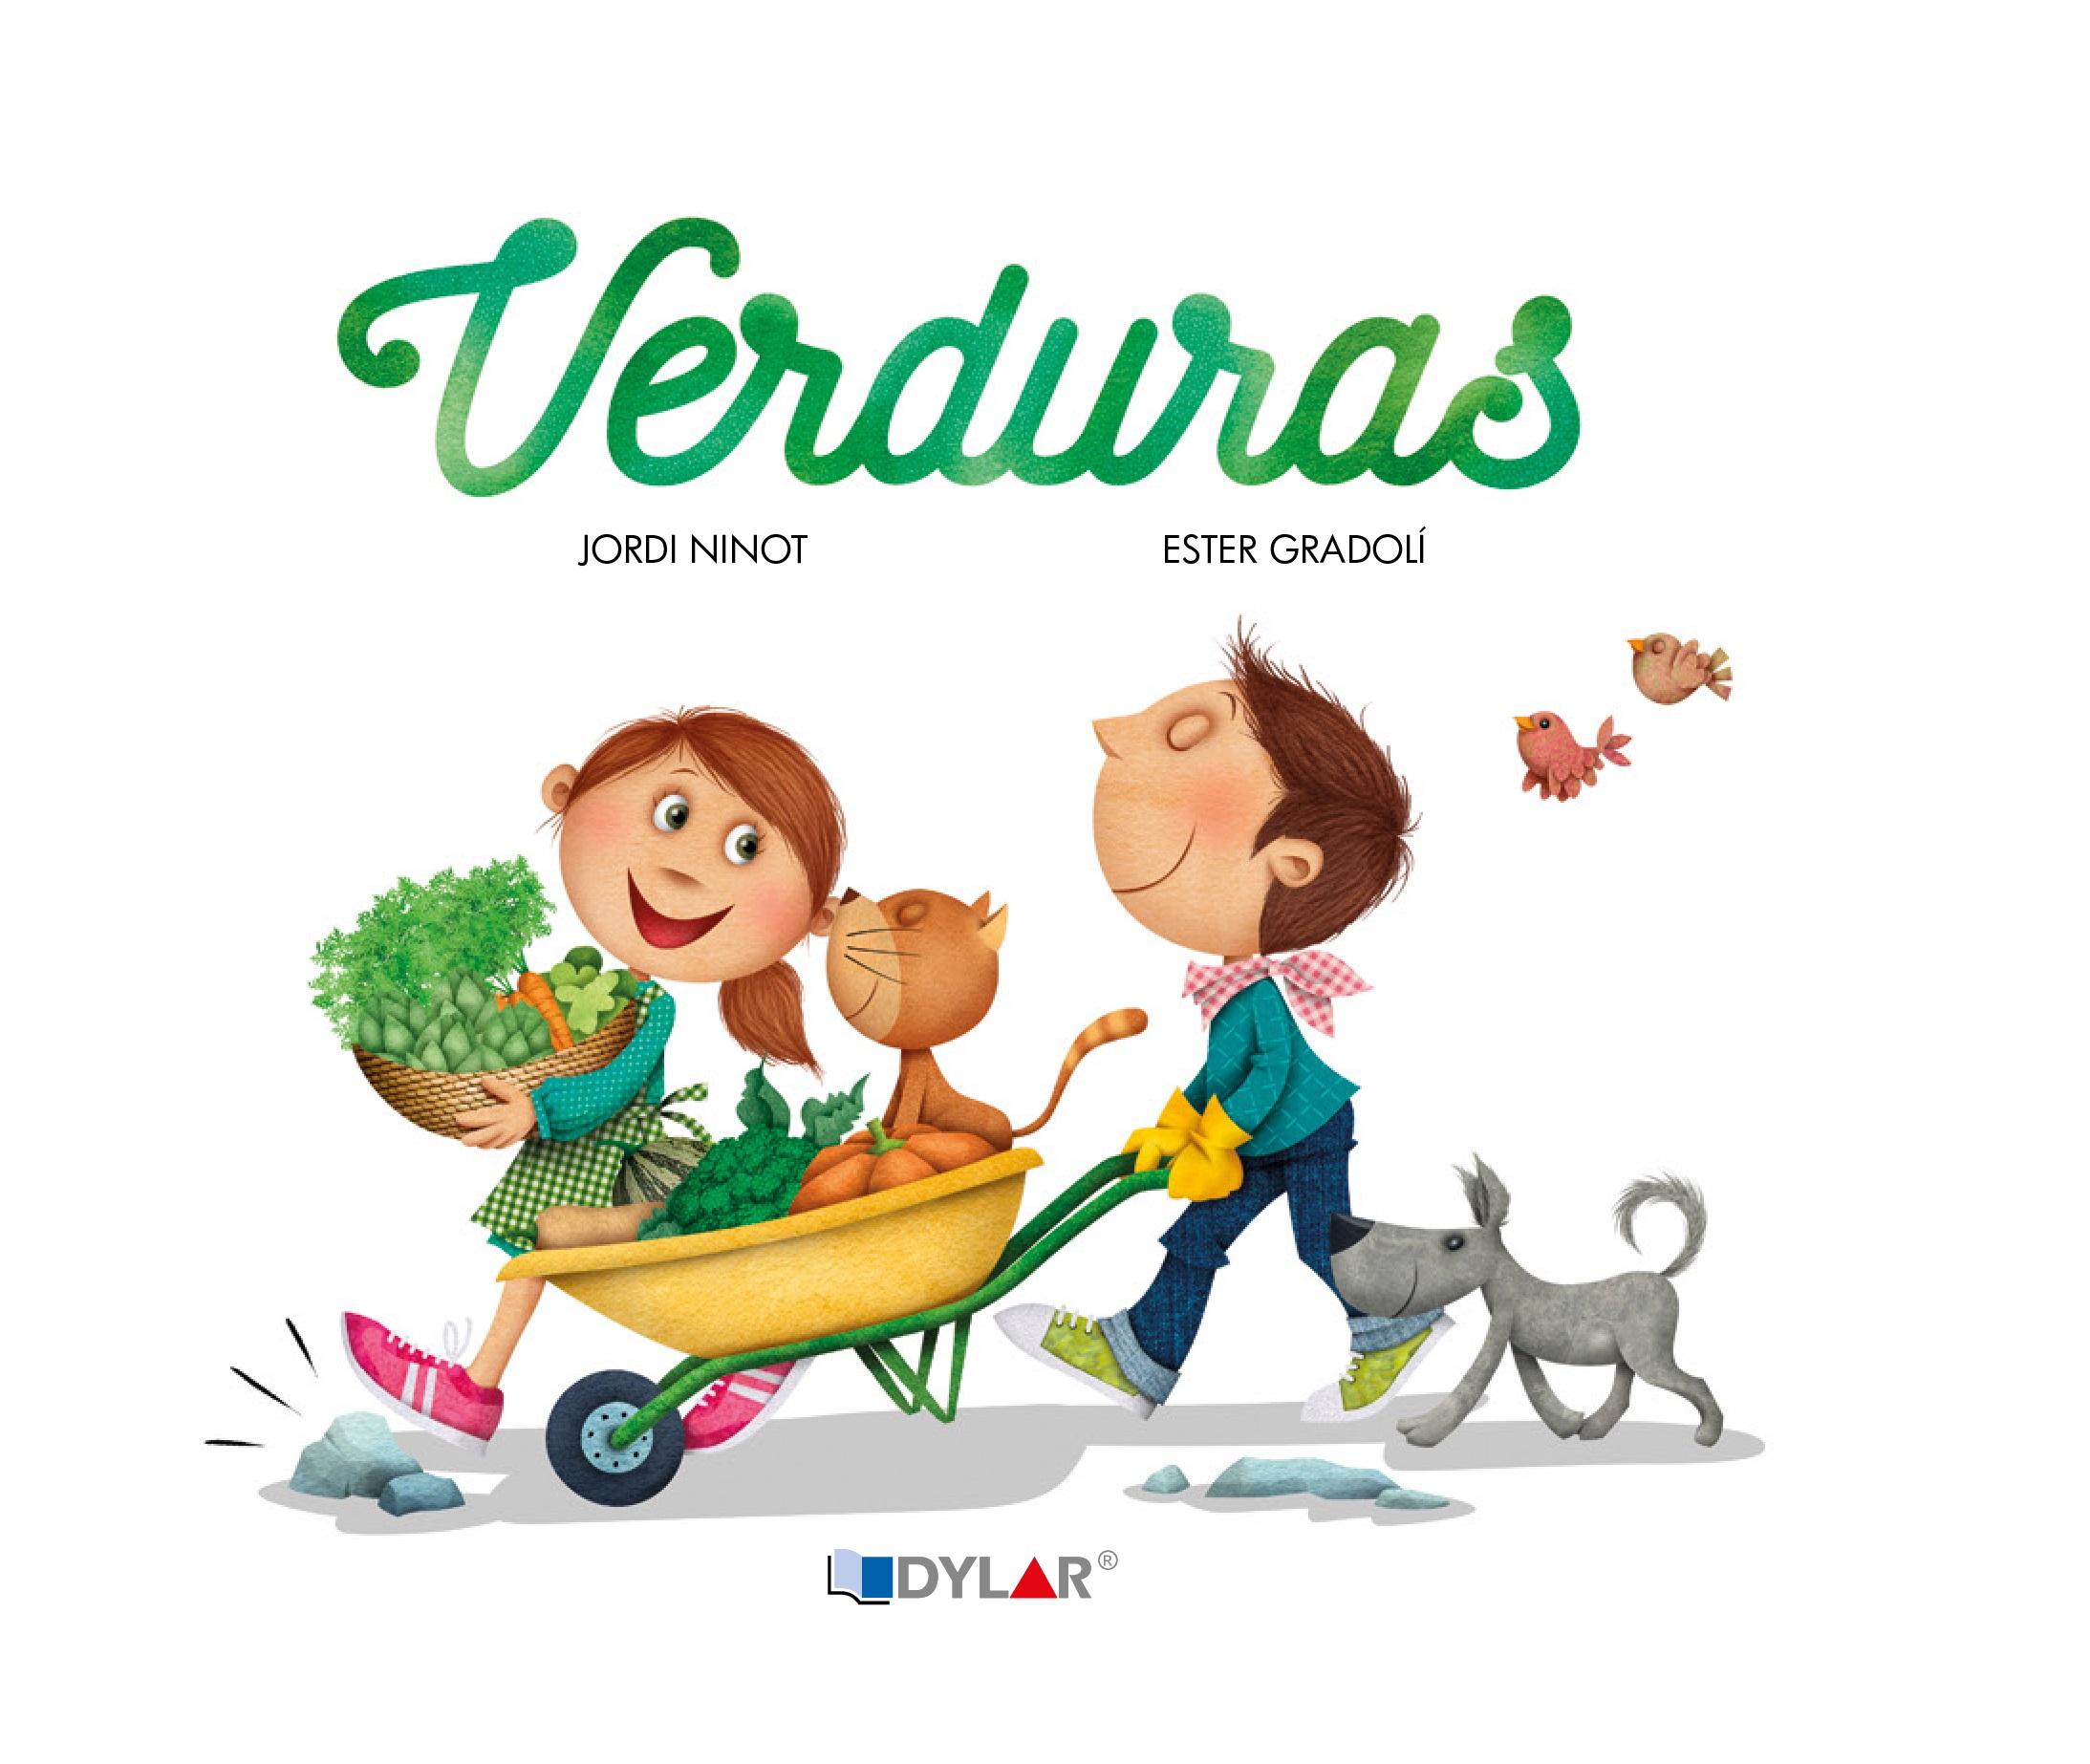 http://www.dylarediciones.com/uploads/libros/826/docs/VERDURAS%20MUESTRA.pdf